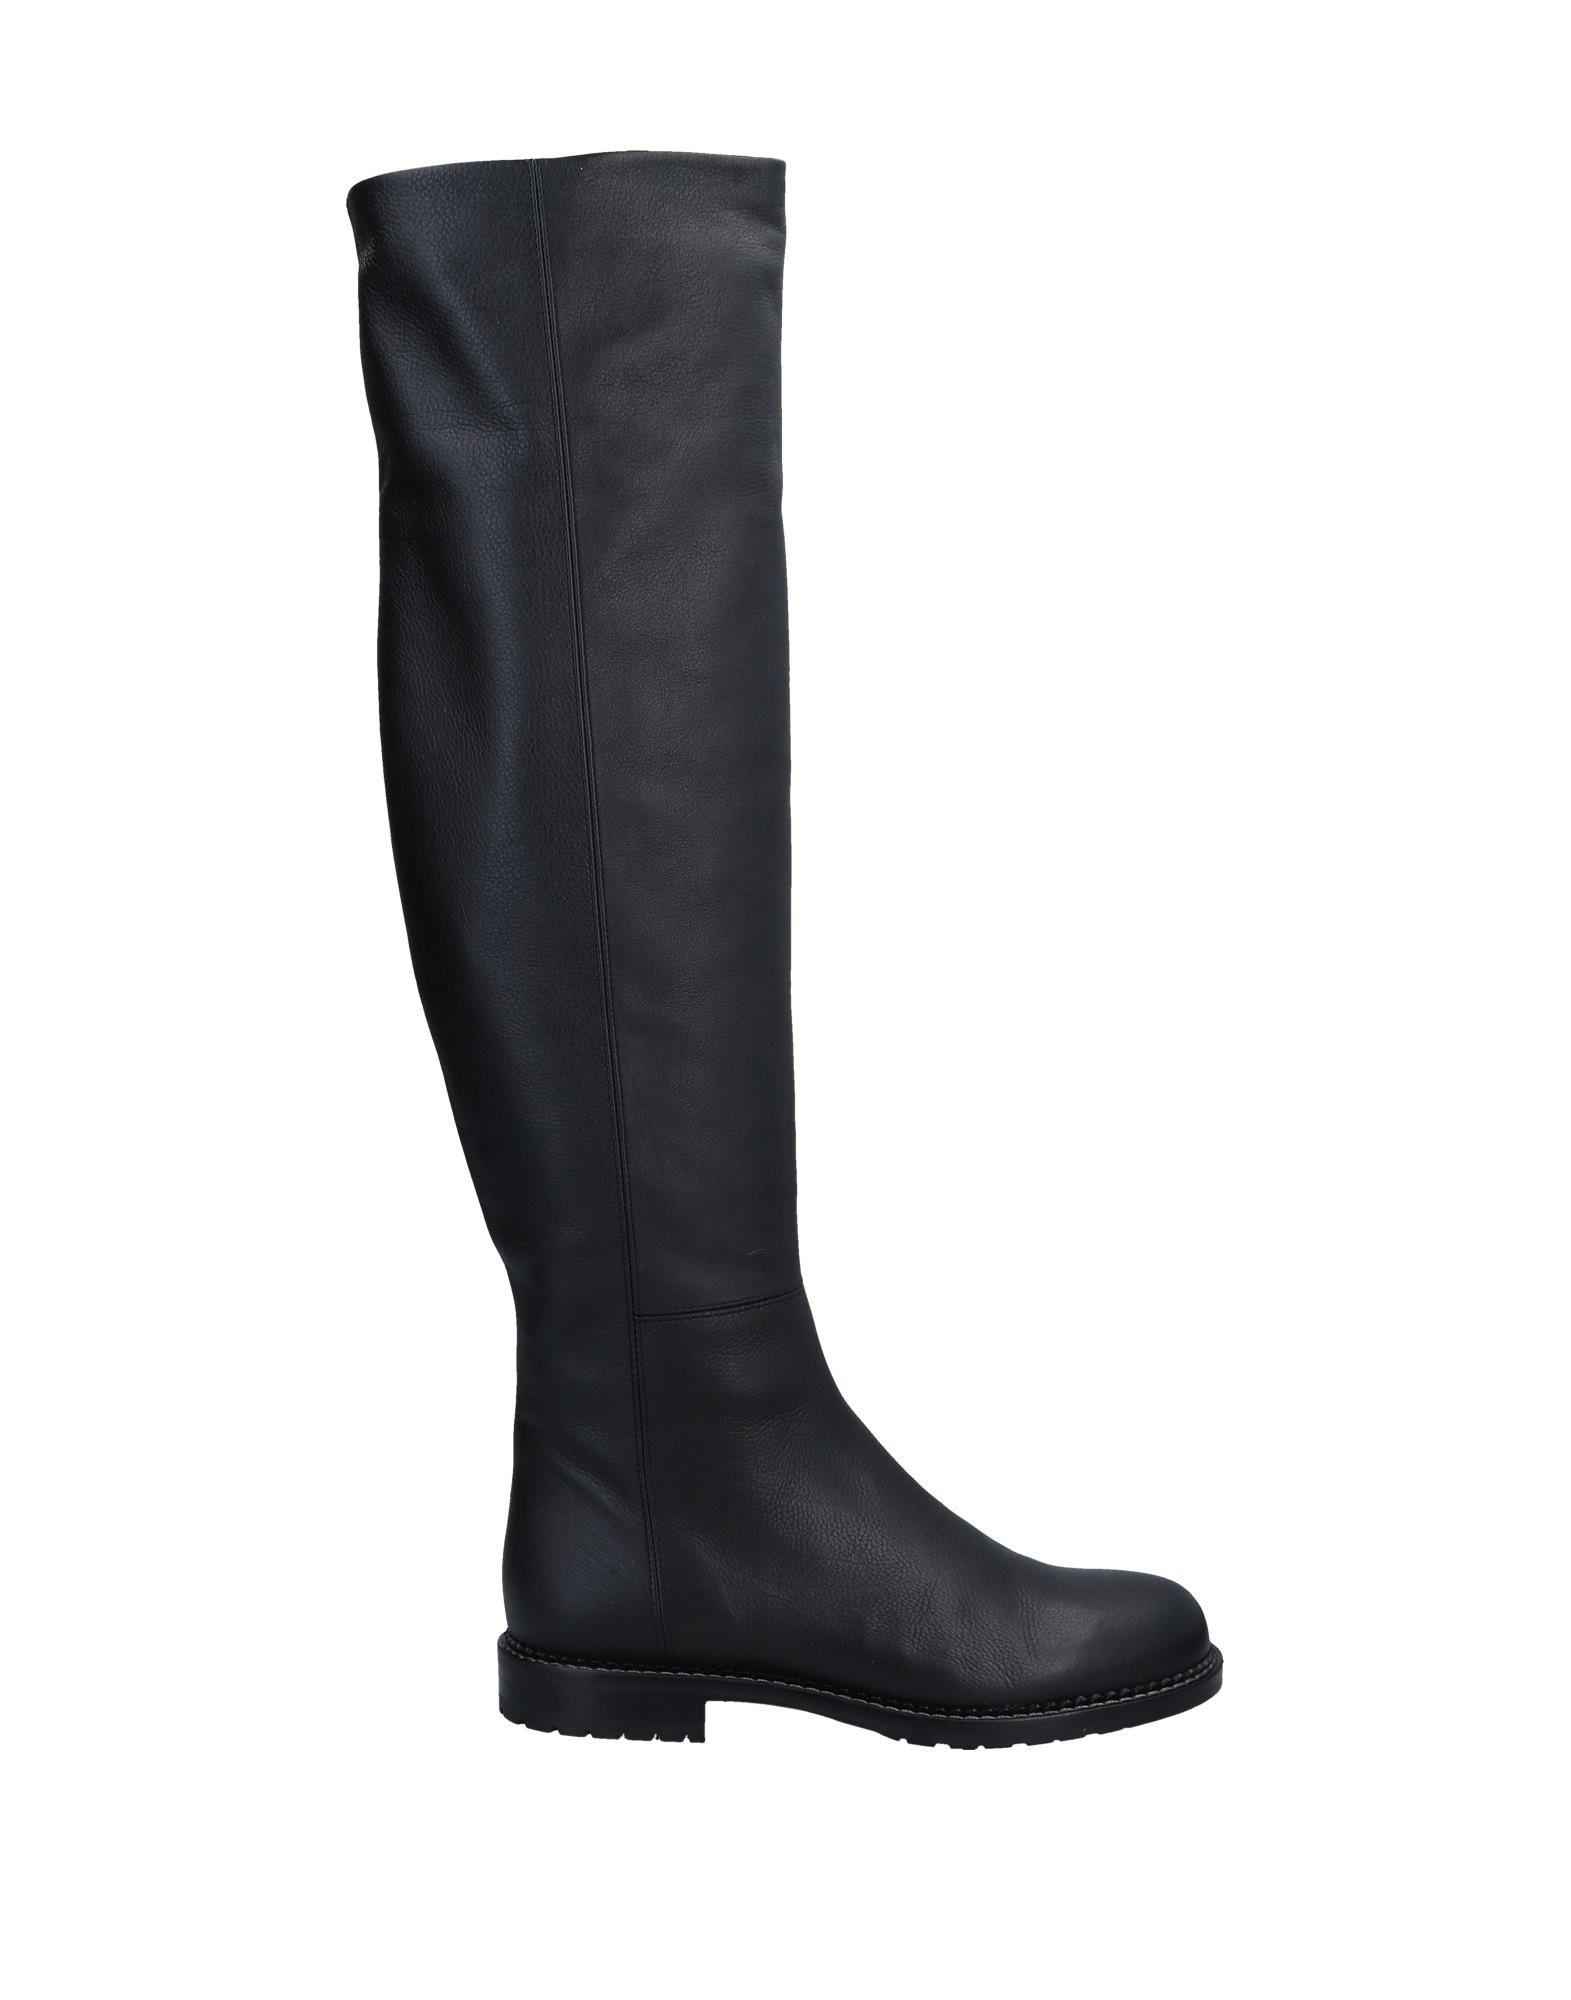 Rabatt Schuhe Loriblu Stiefel  Damen  Stiefel 11560485GP ae2842